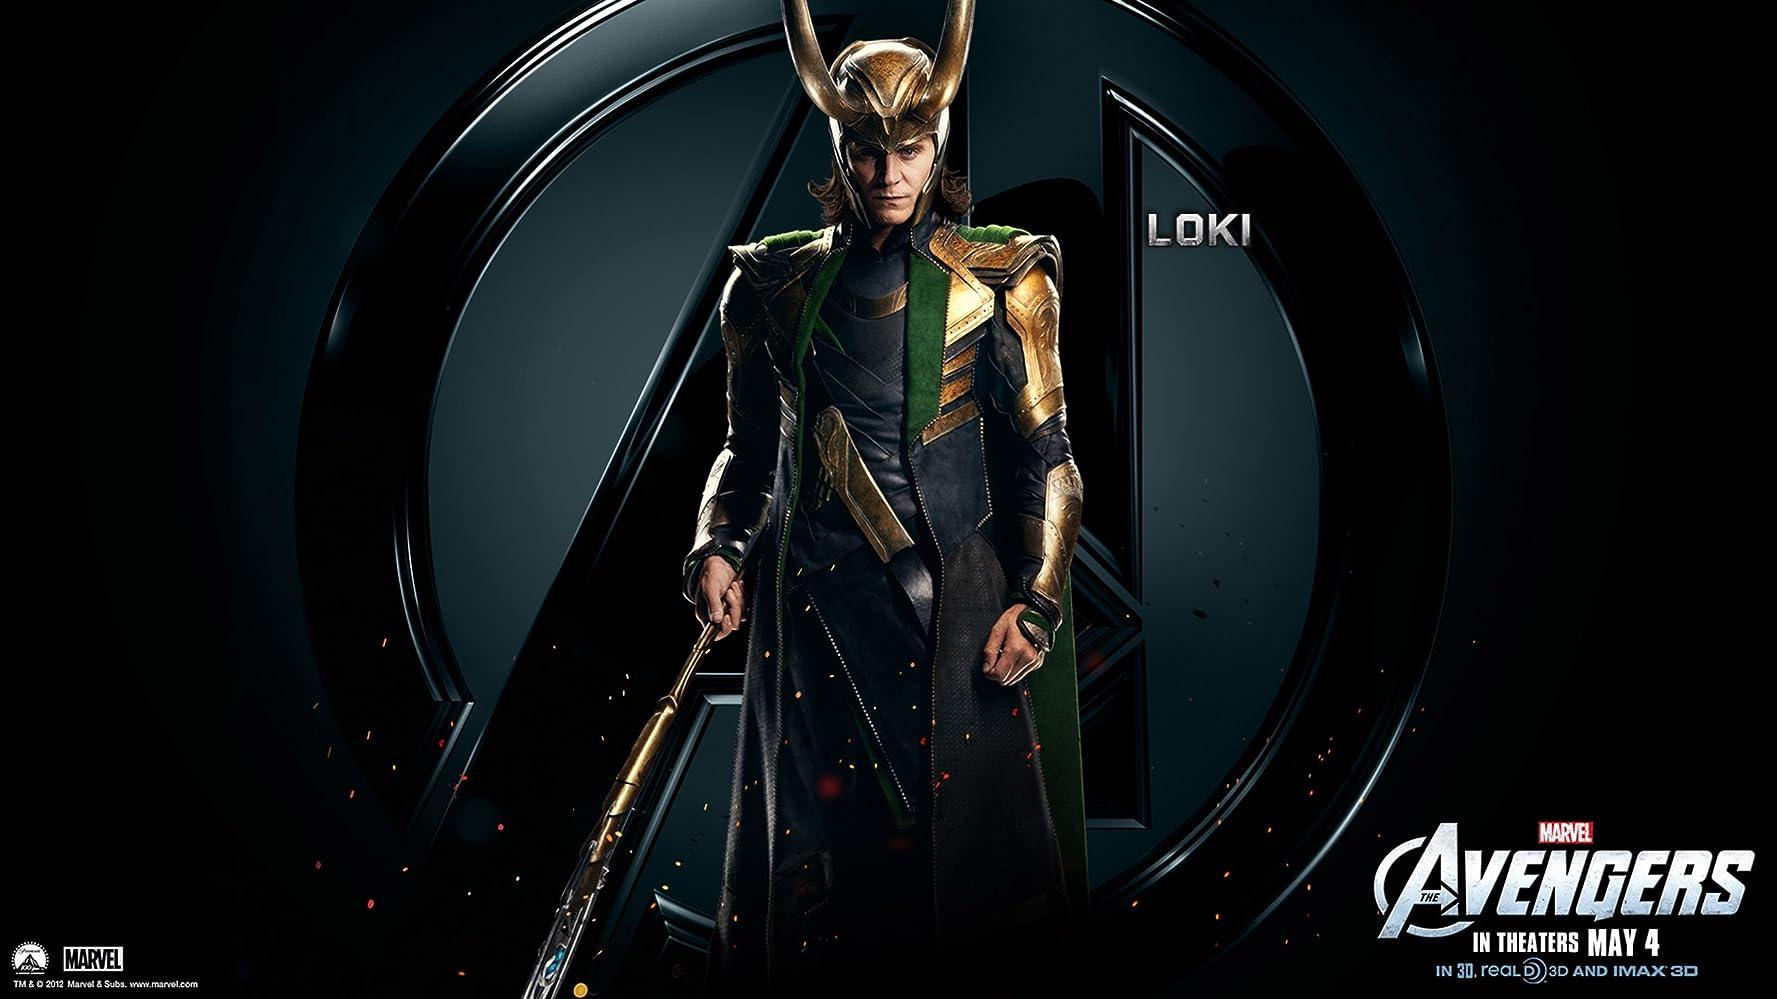 Tom Hiddleston as Loki / Avengers (2012) / IMDB.com